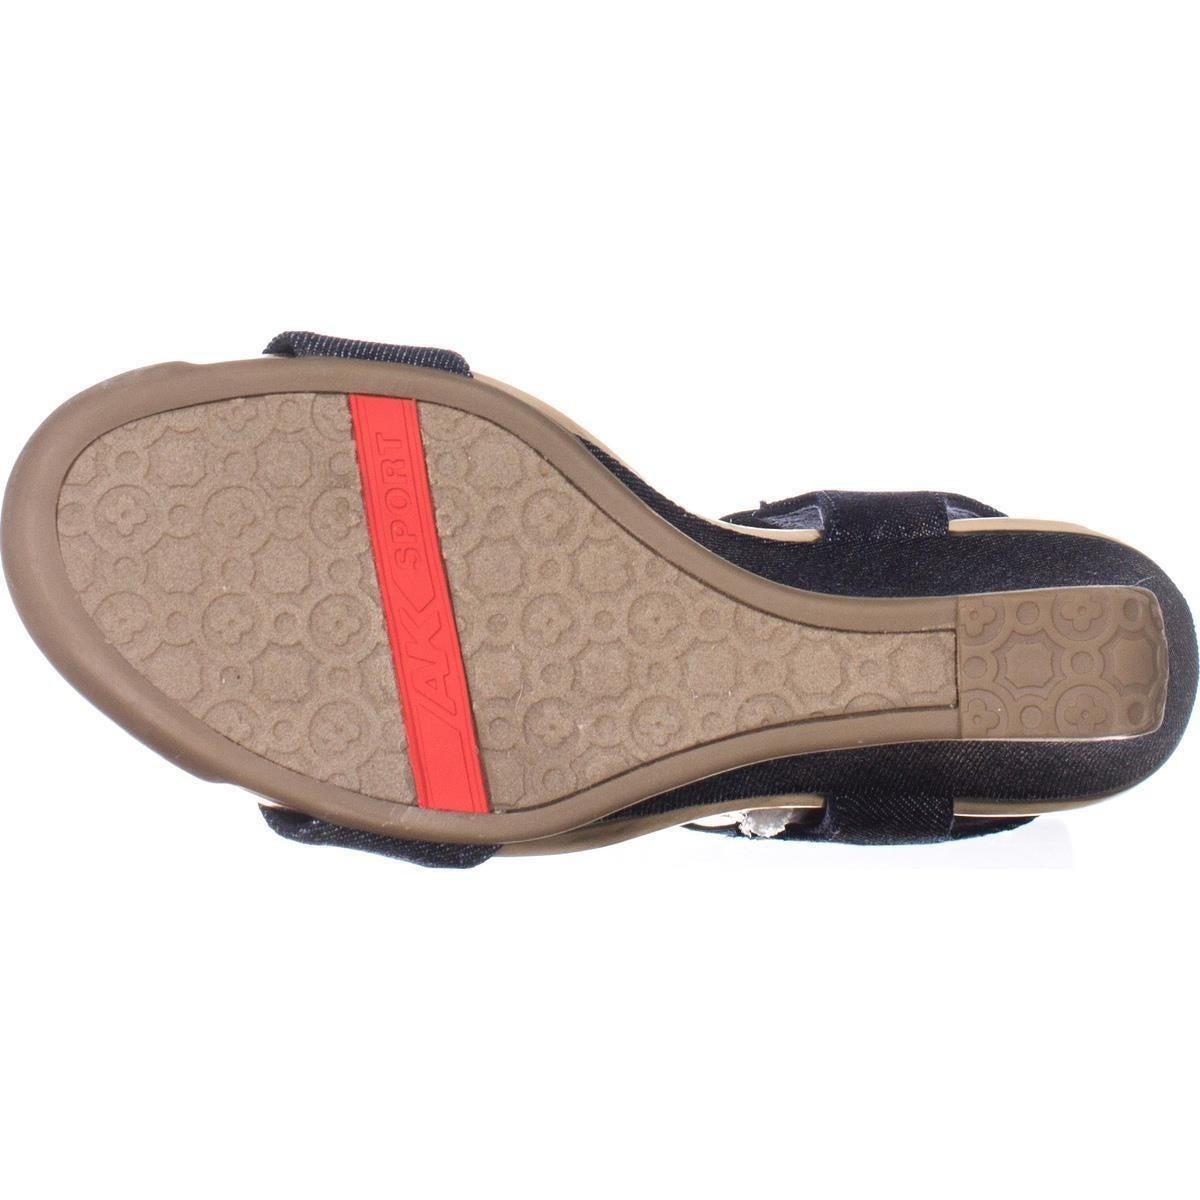 f741c0f4ac Shop AK Anne Klein Sport Latasha Comfort Wedge Sandals, Dark Blue/Gold -  Free Shipping Today - Overstock - 17434467